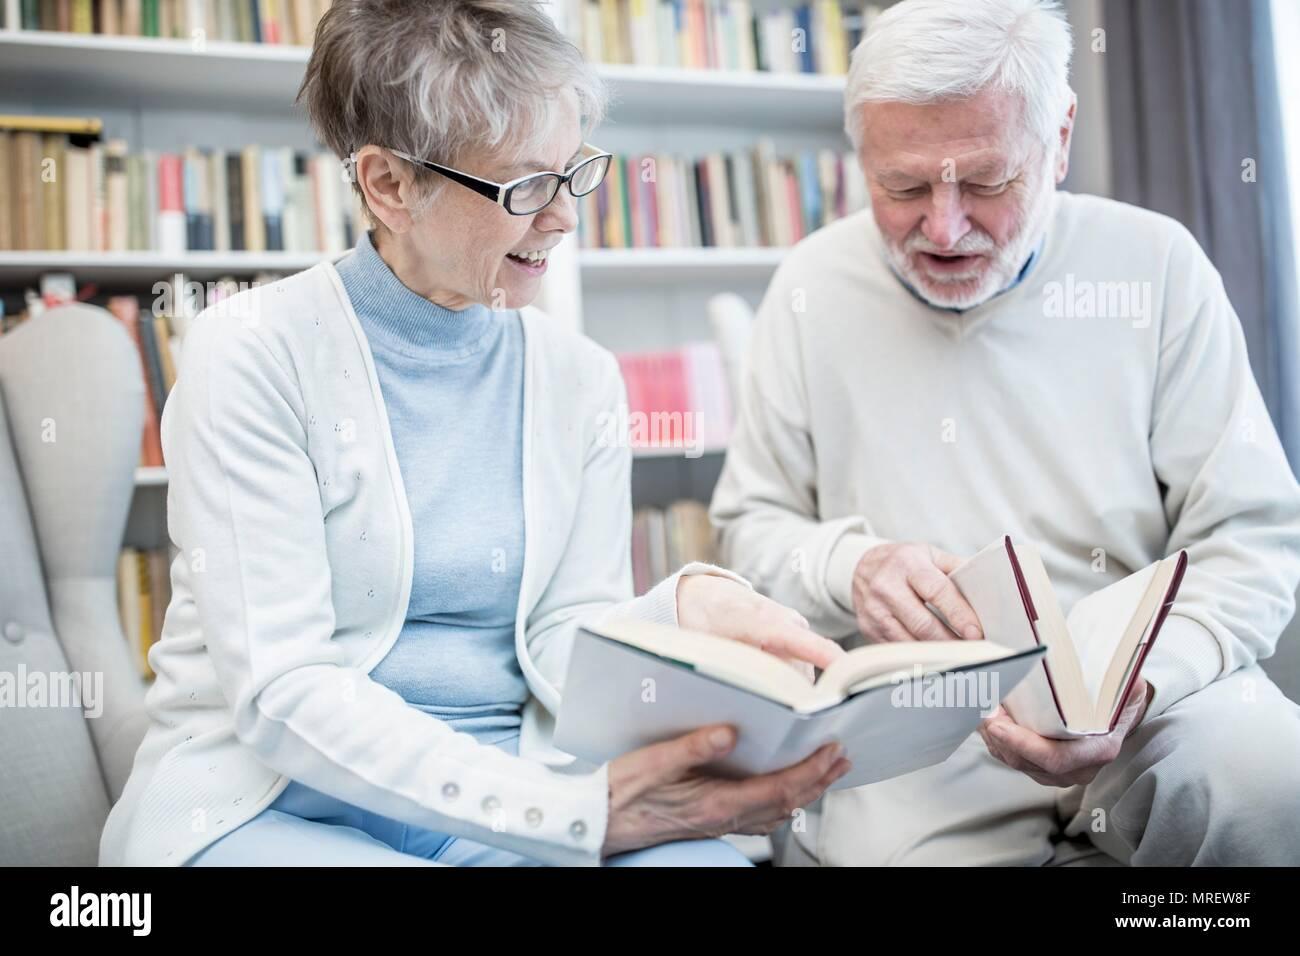 Senior Pareja leyendo libros. Imagen De Stock